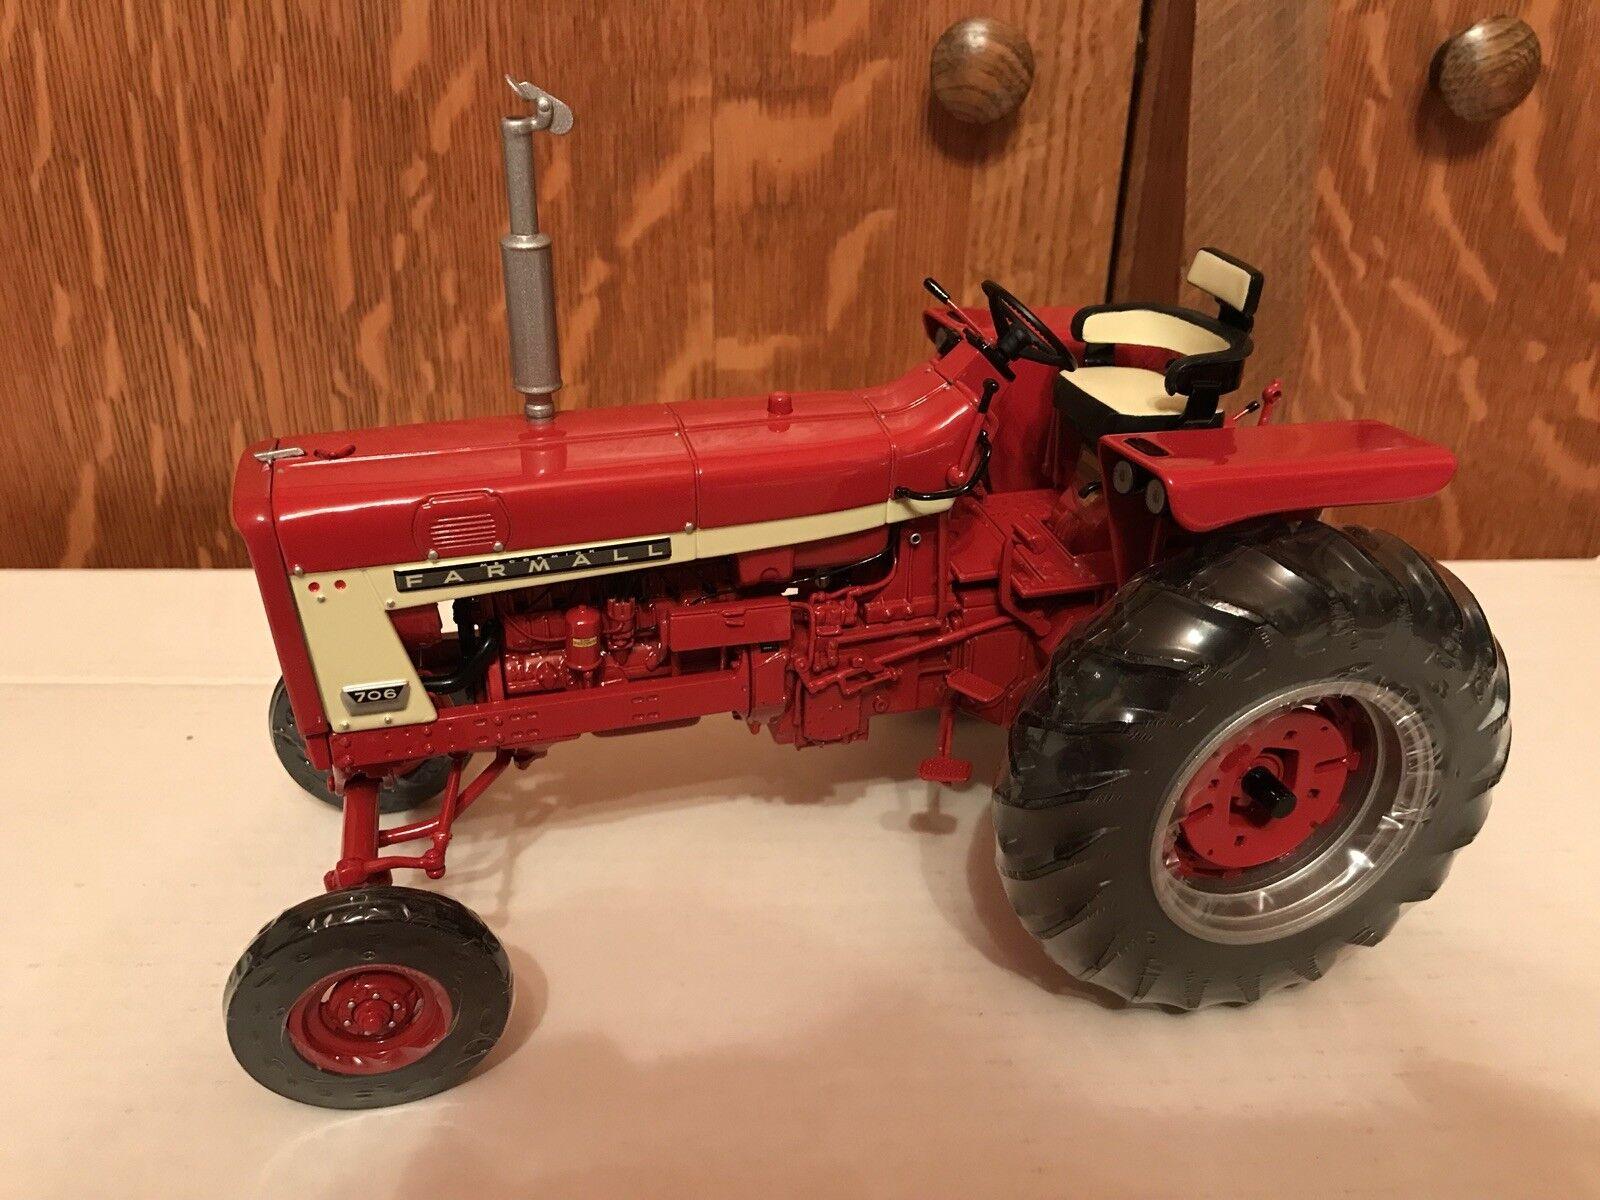 venta mundialmente famosa en línea Ertl IH Farmall 706 Precision series series series 16 1 16 Escala Modelo Tractor  gran descuento